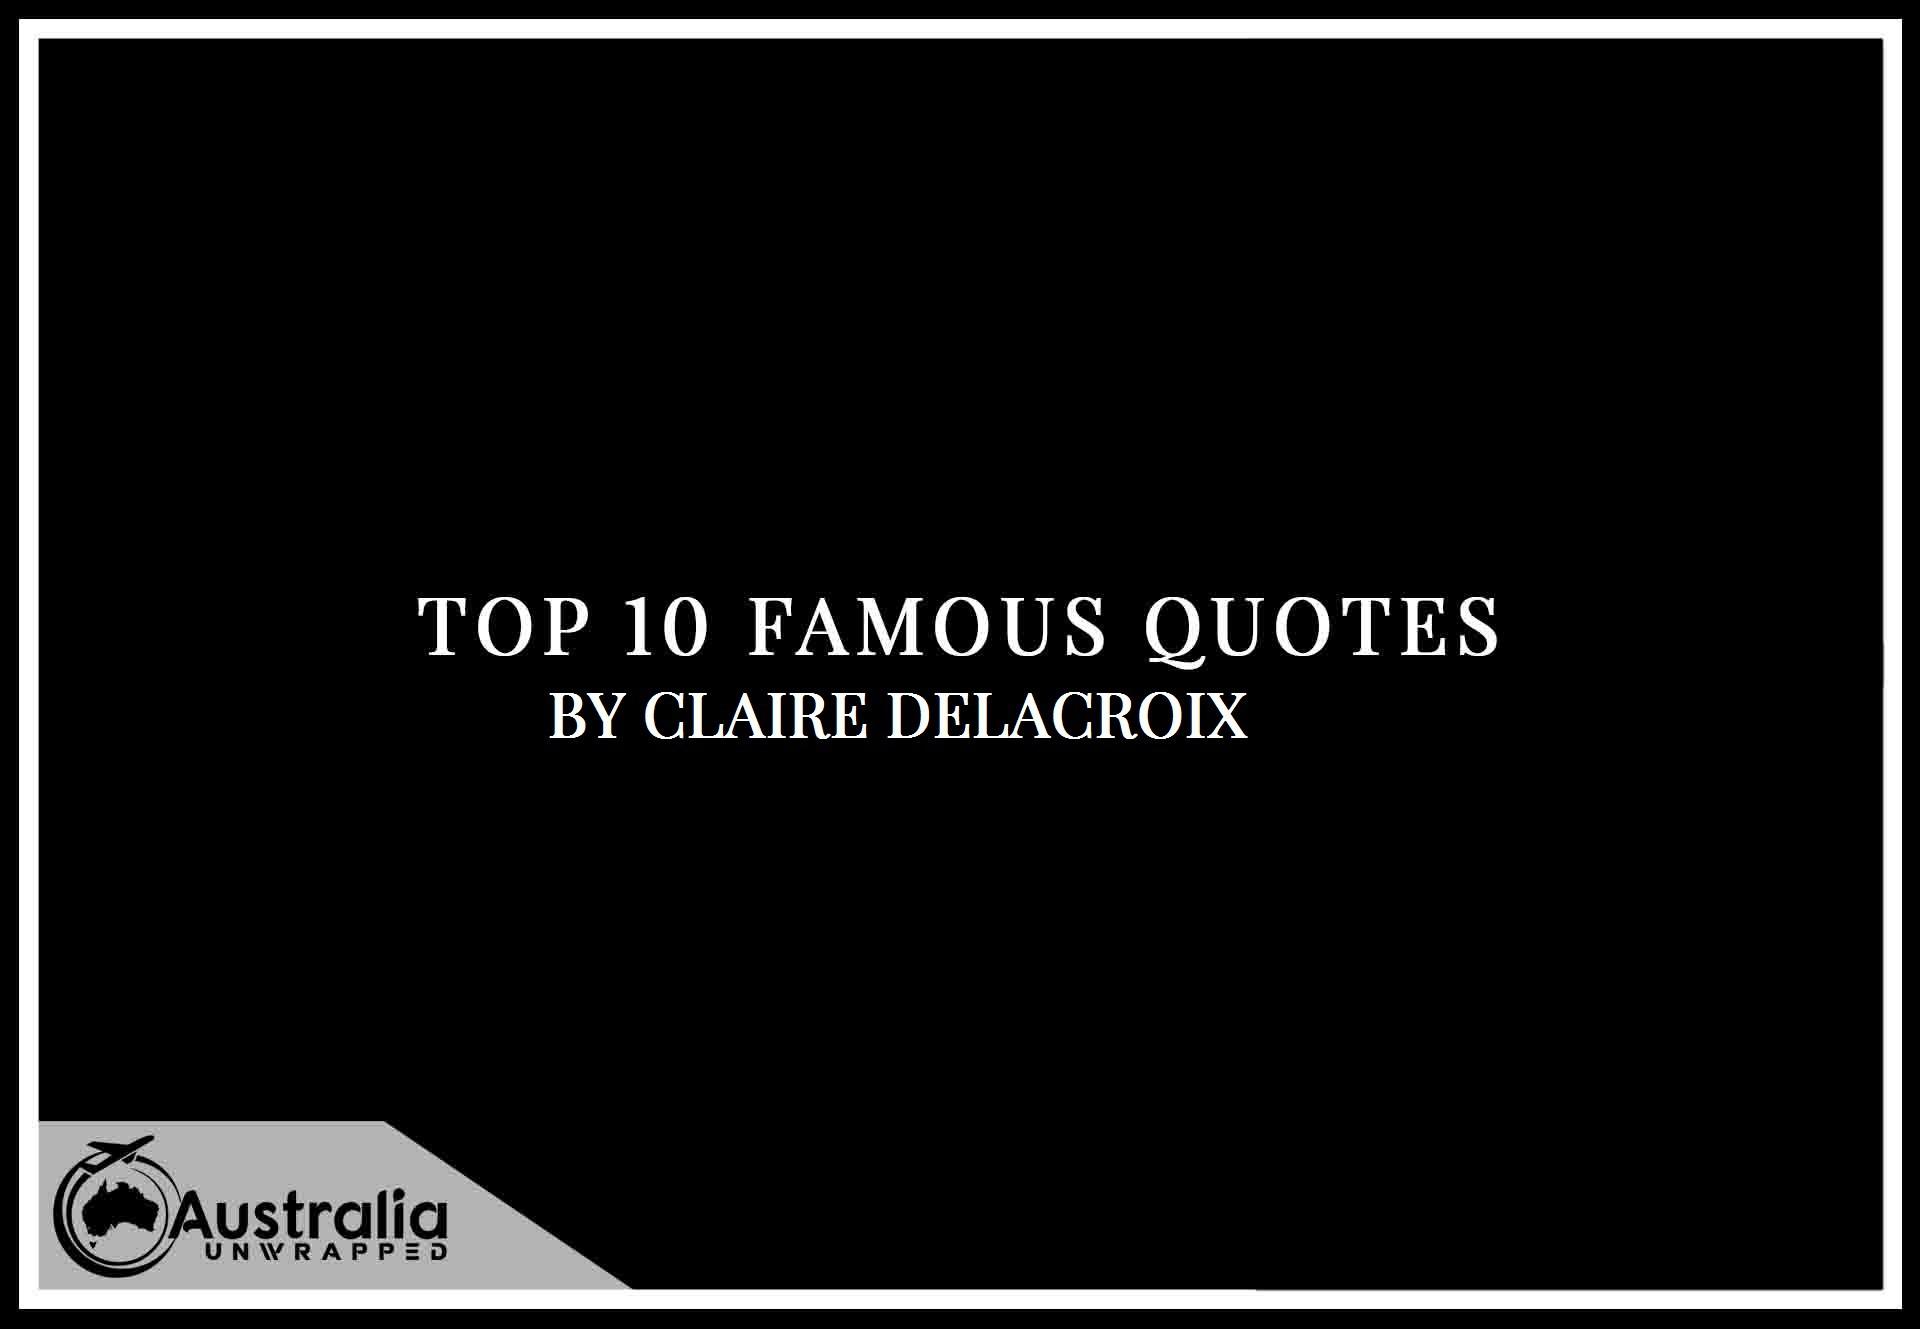 Claire Delacroix's Top 10 Popular and Famous Quotes